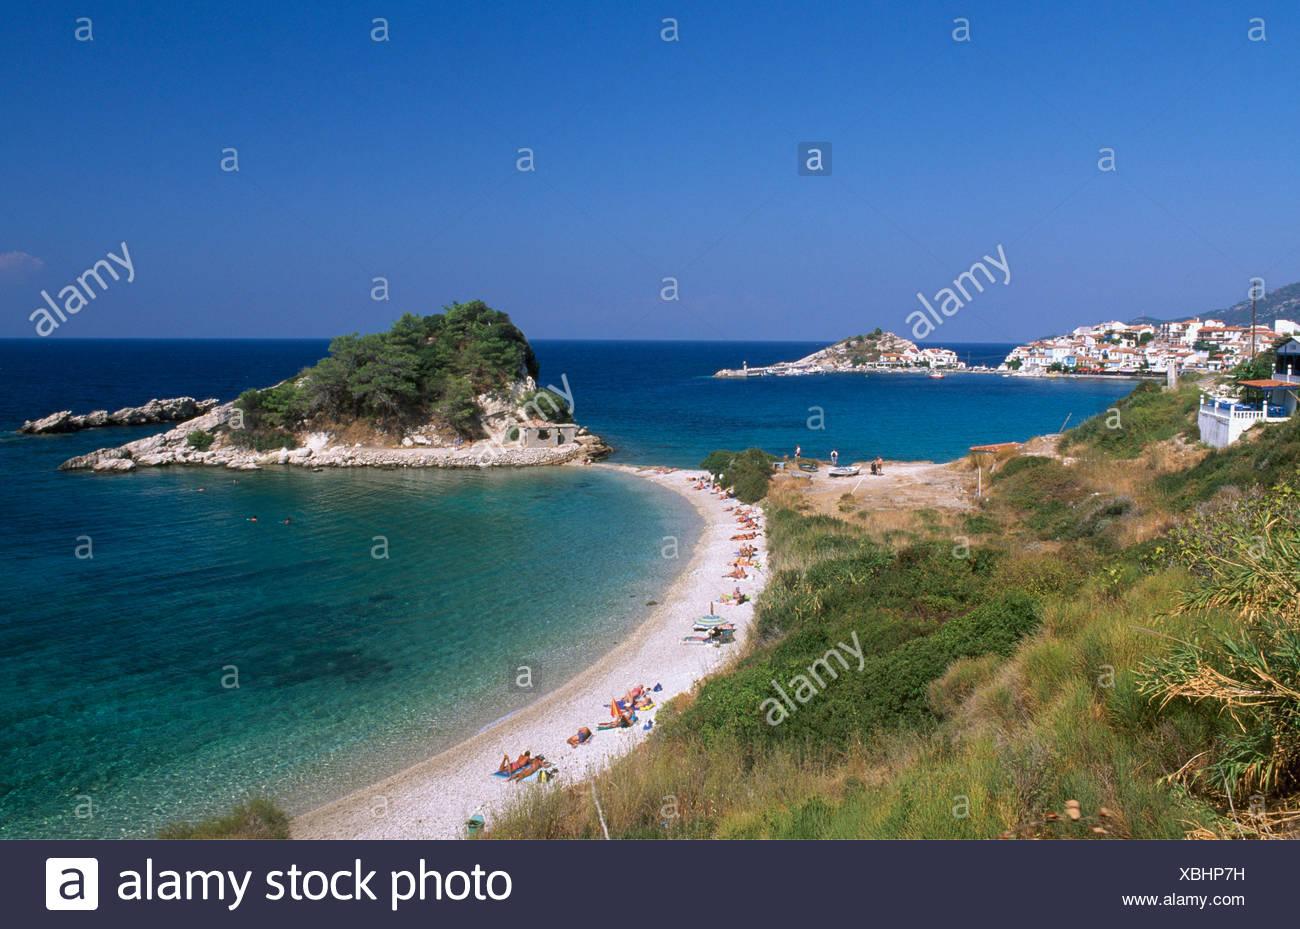 Kokkari Beach, l'île de Samos, Grèce, Europe Photo Stock